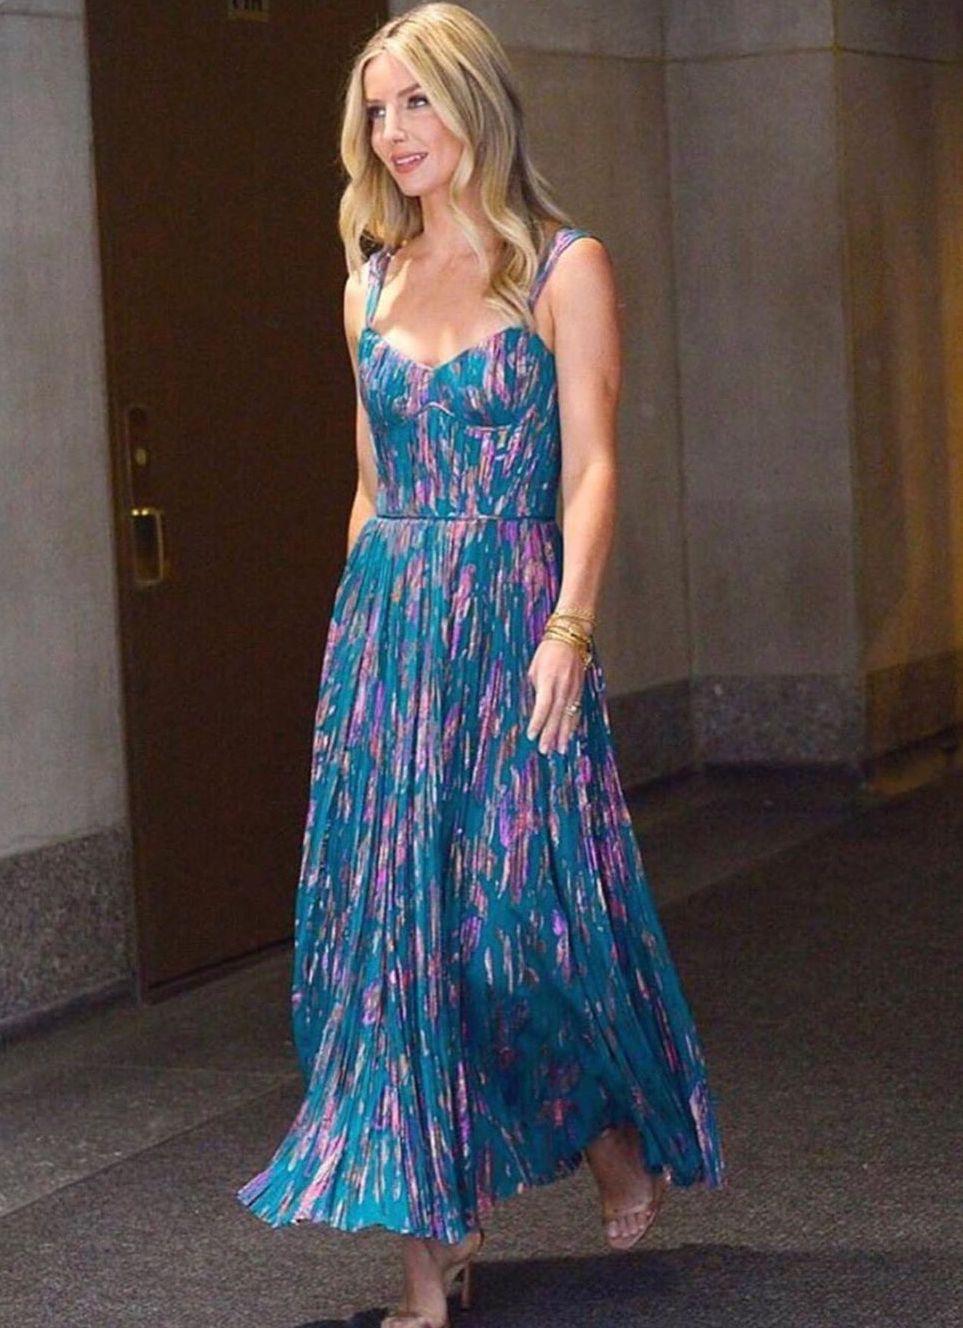 annabelle-wallis-j-mendel-blue-floral-dress.jpg